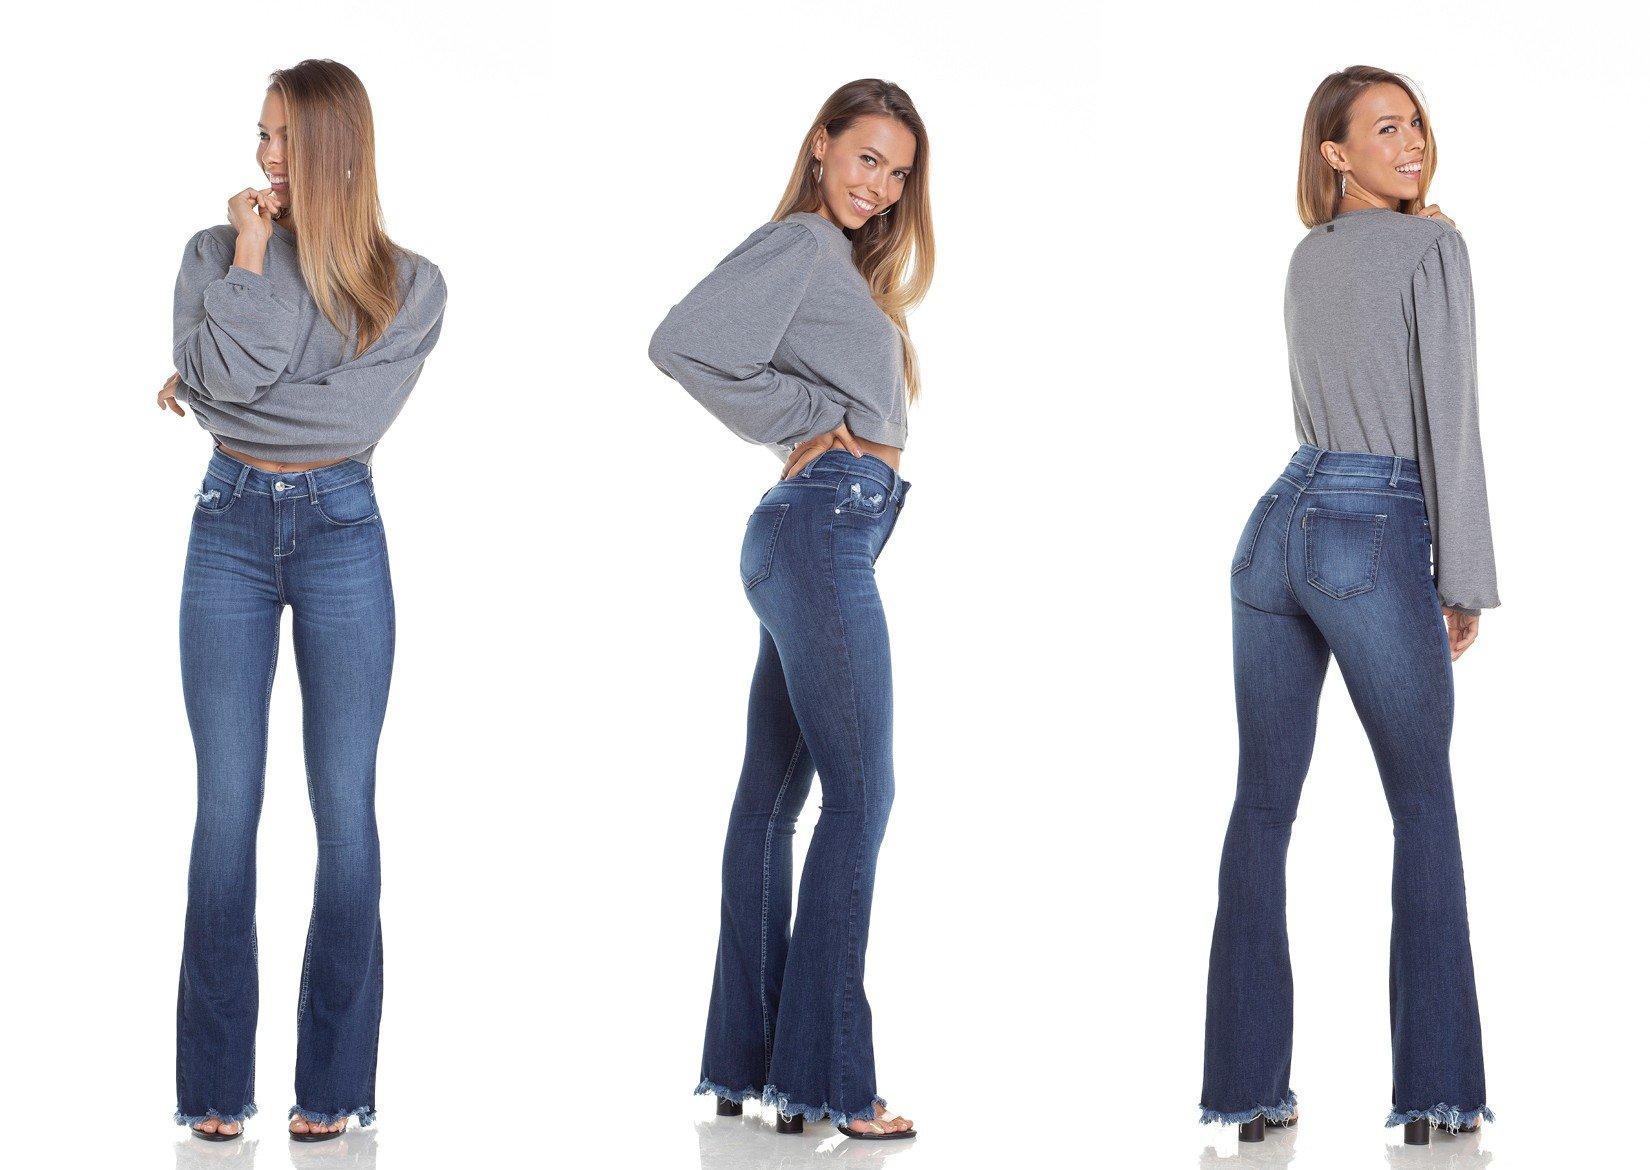 dz2949 calca jeans flare media com bigodes tripla denim zero